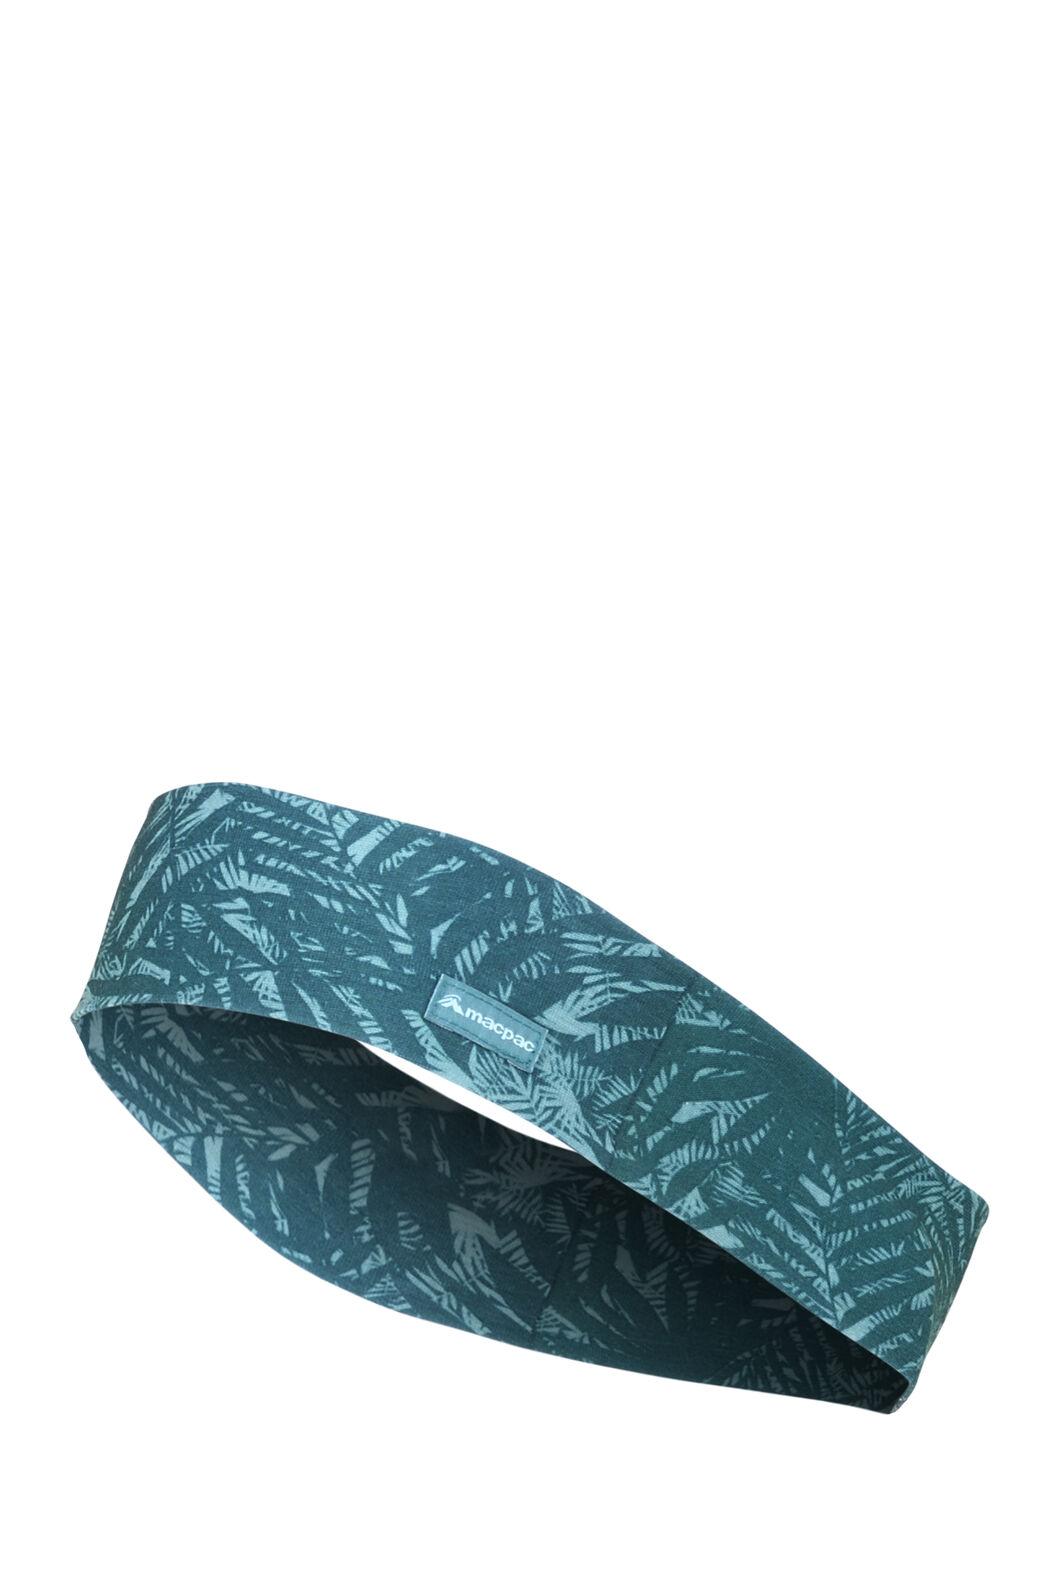 Macpac Light Headband, Bayberry Print, hi-res